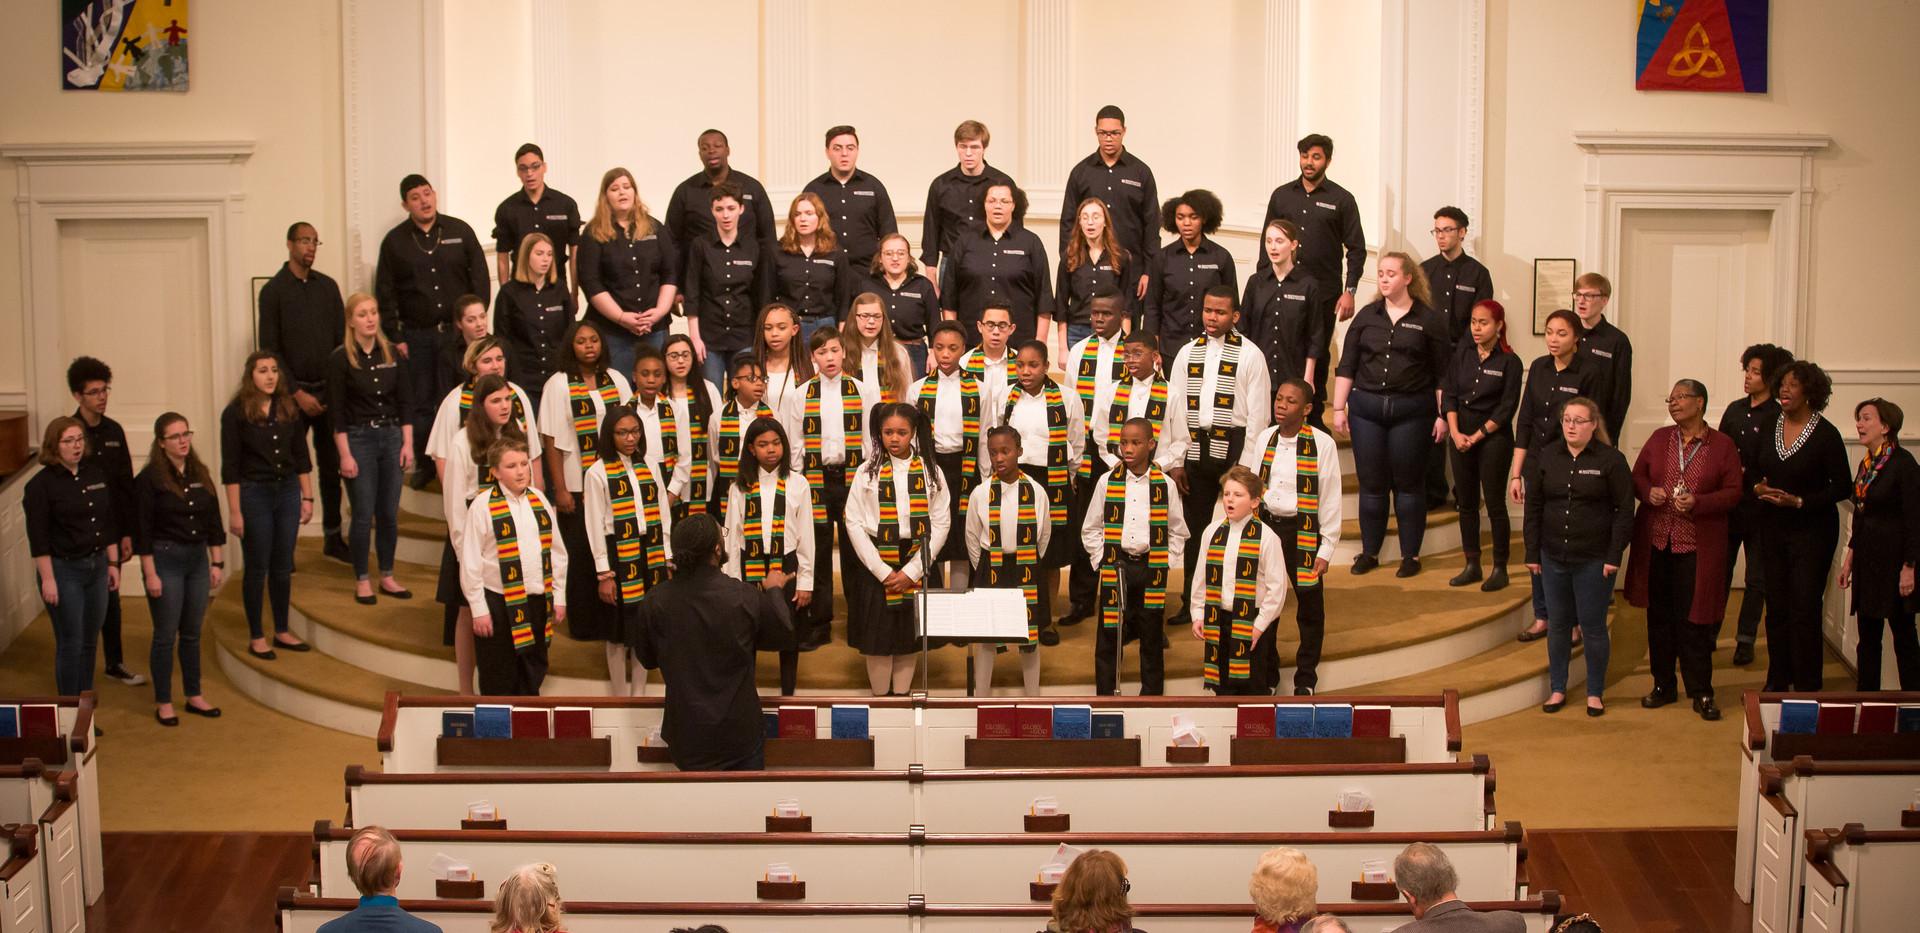 272-TCC Black History Concert.jpg